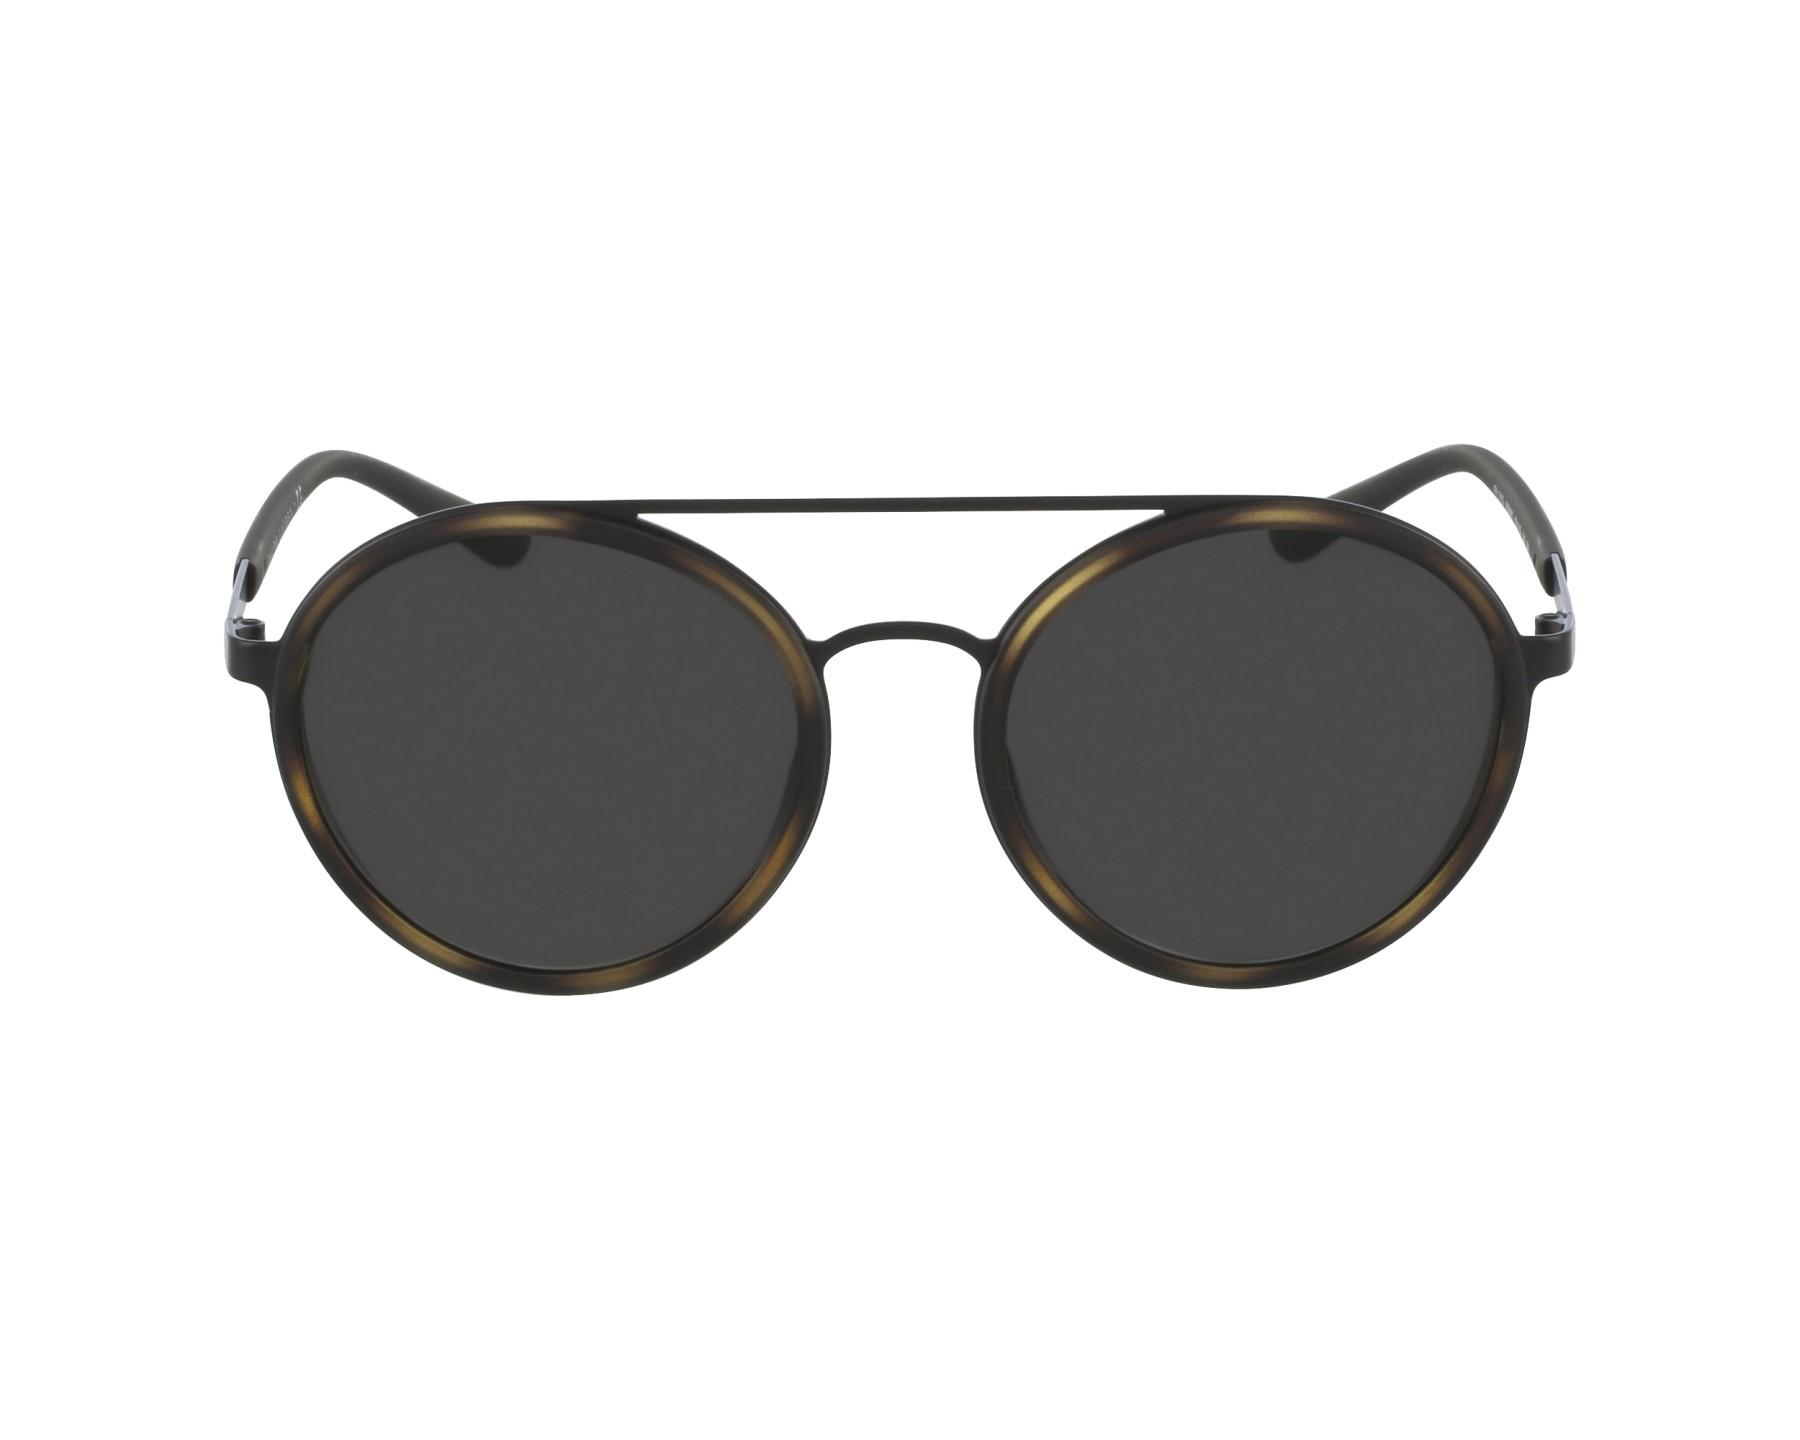 Polo Ralph Lauren PH 3103 9038/87 Sonnenbrille eZMO1OWKh